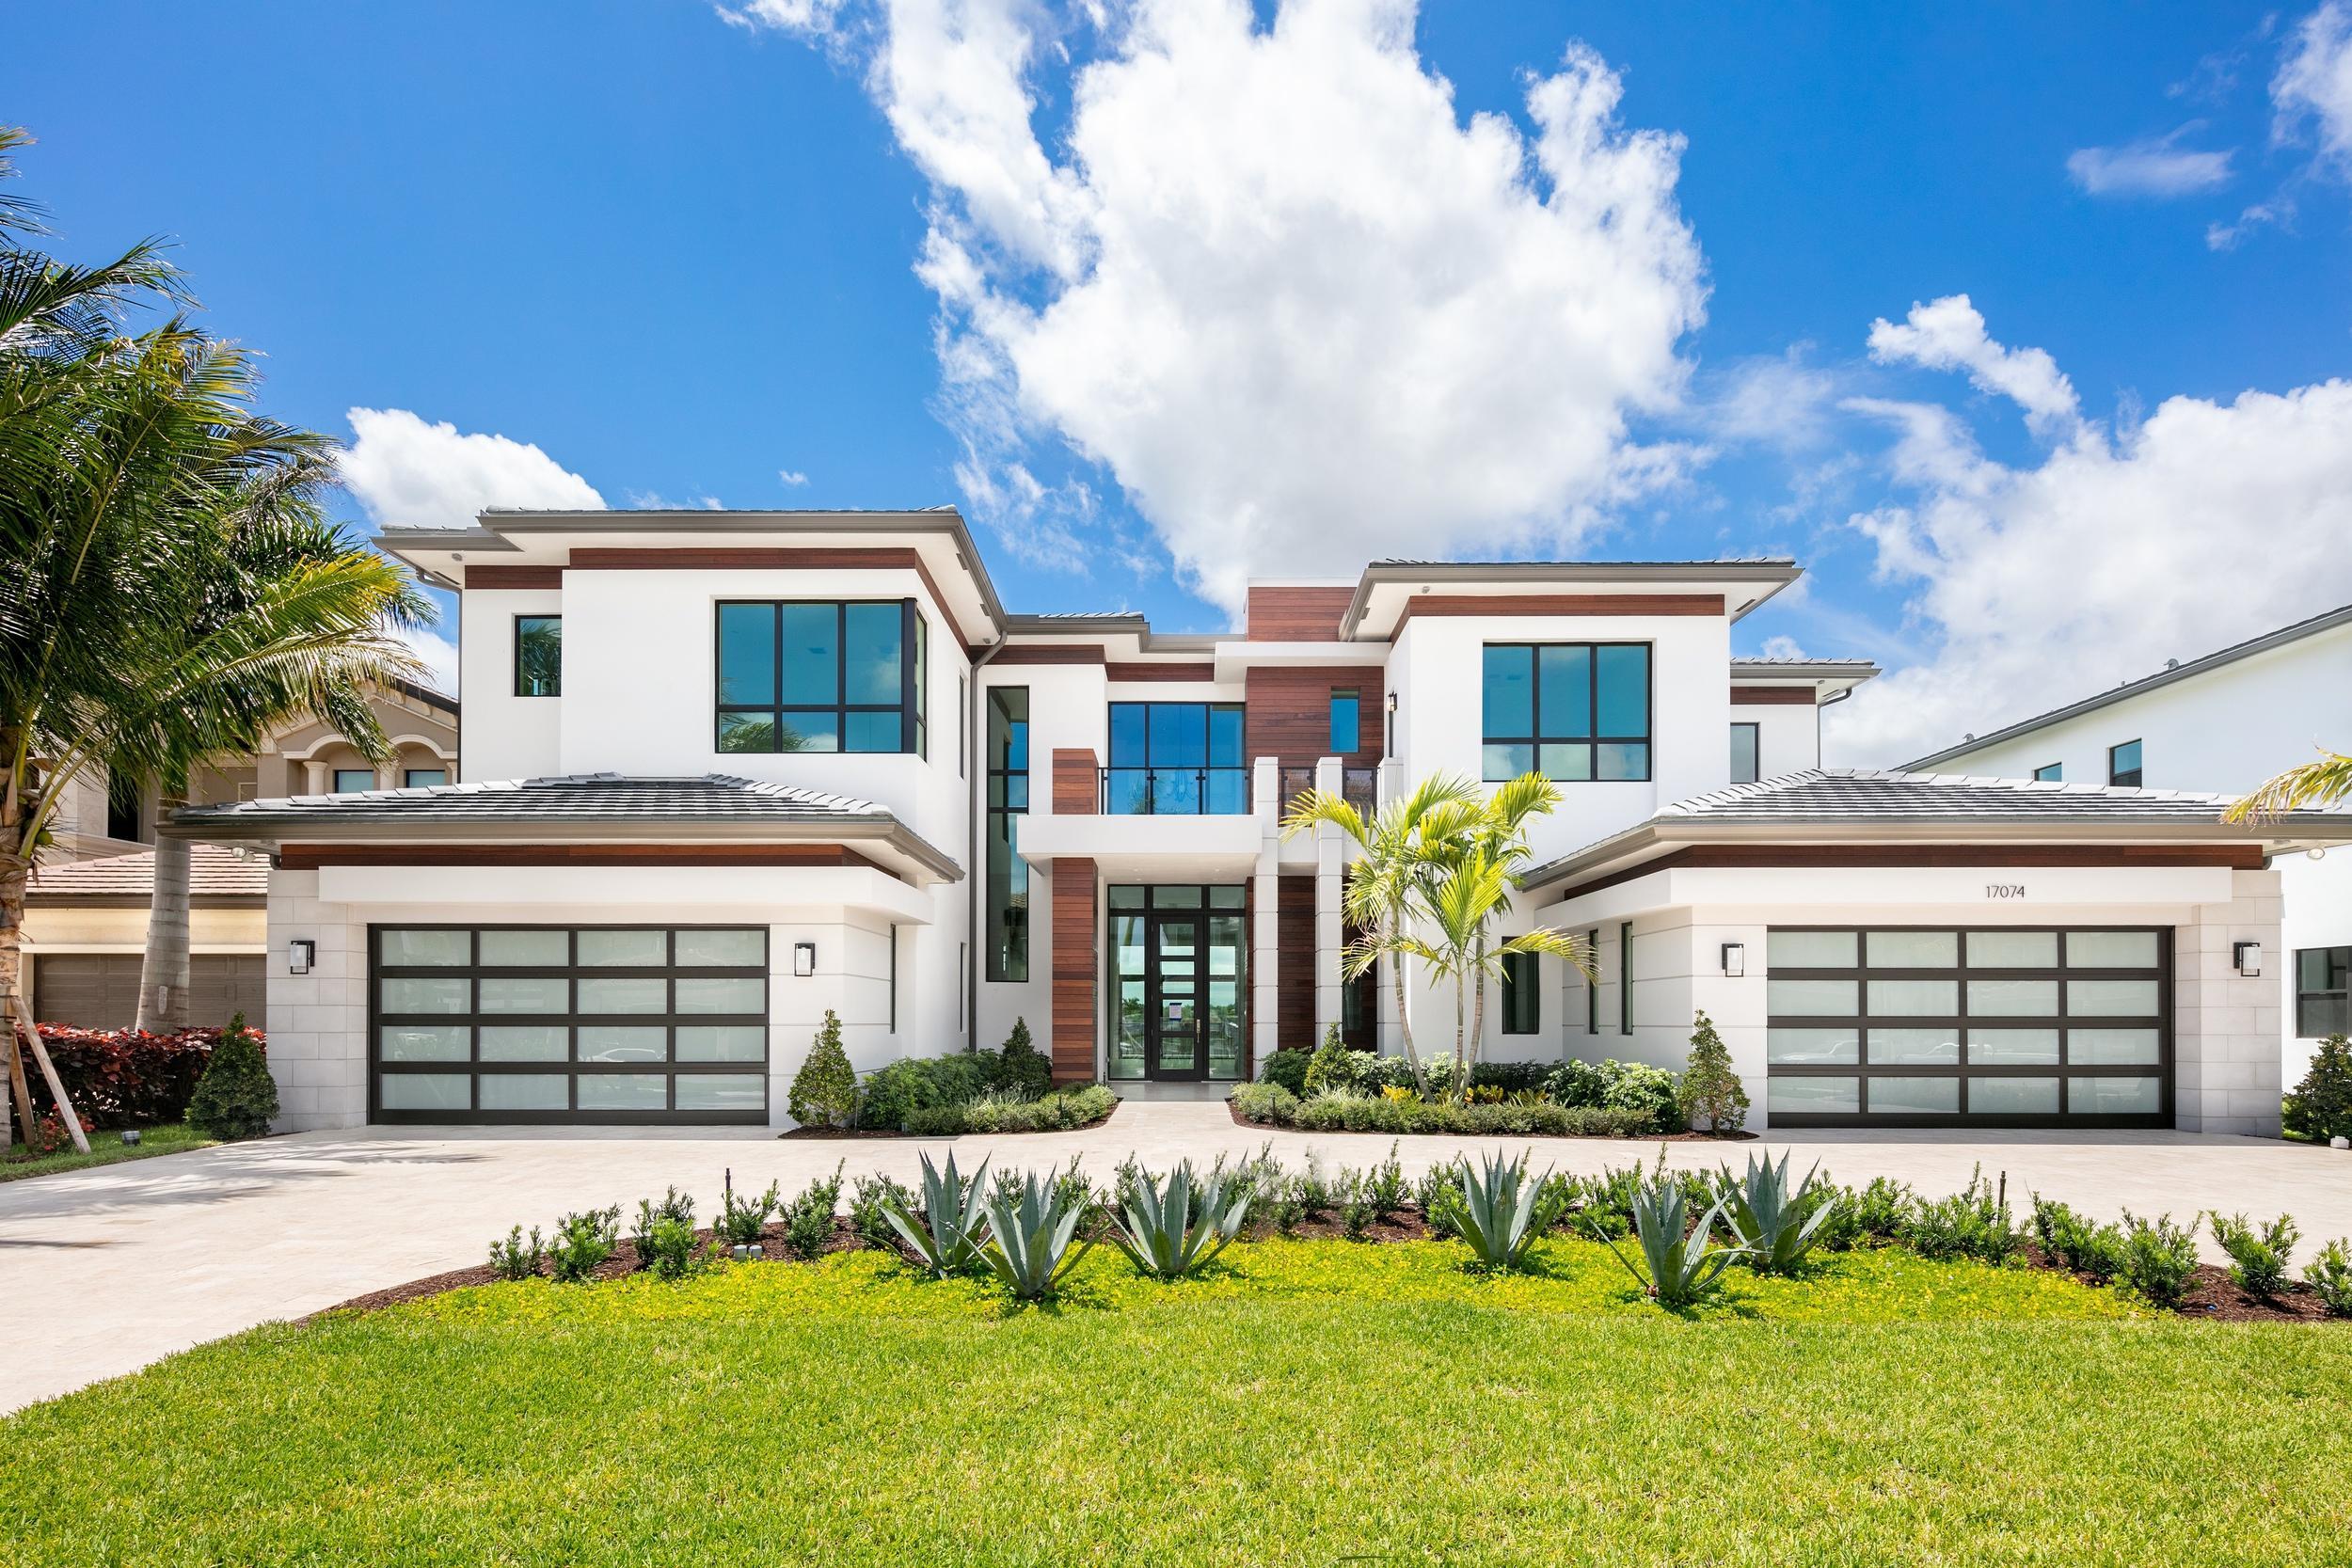 17074 Brulee Breeze Way Boca Raton, FL 33496